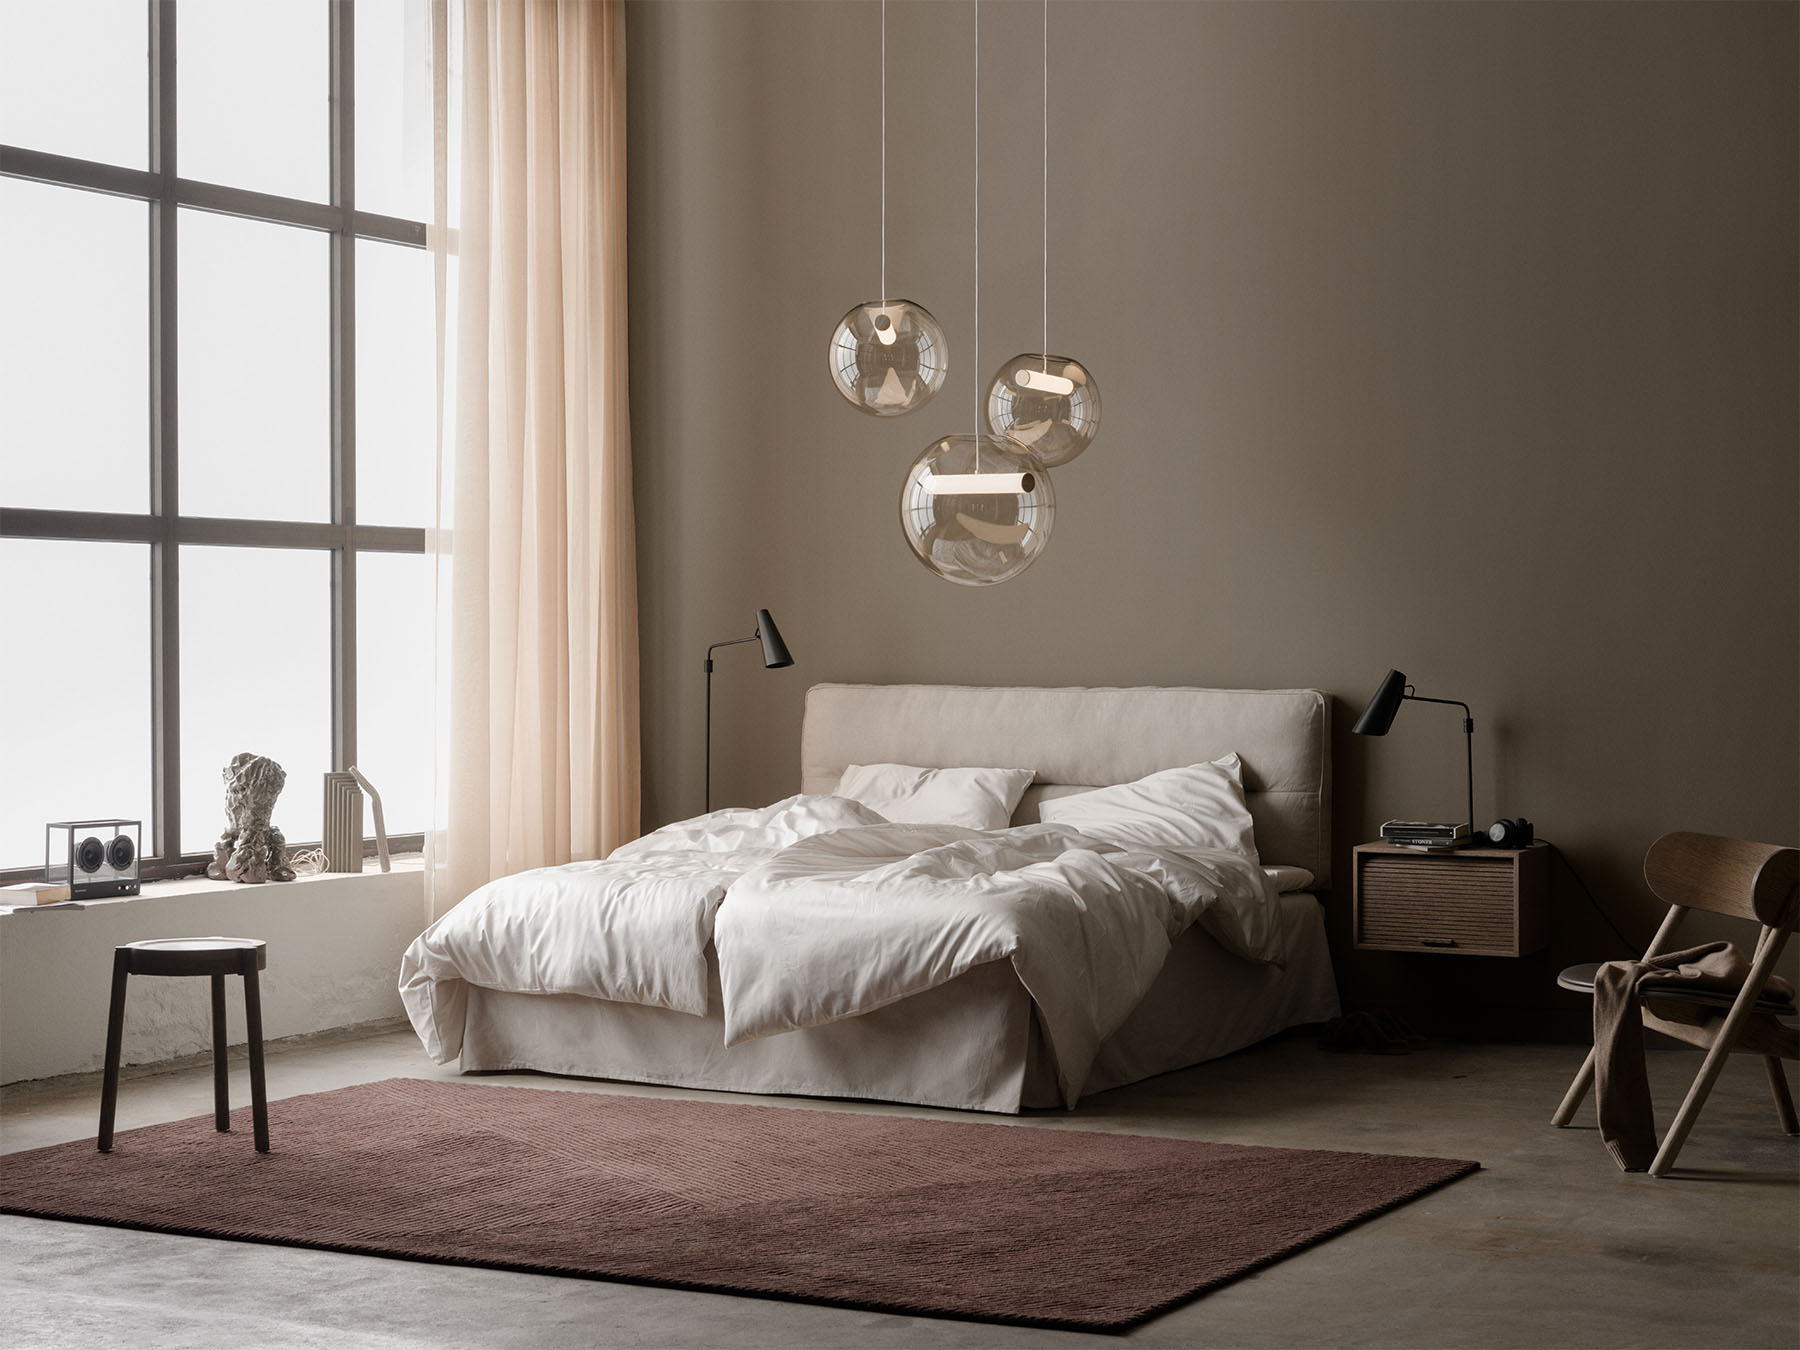 Reveal_pendant_group_Birdy_Row_bedroom_Northern_Photo_Einar_Aslaksen_Low-res